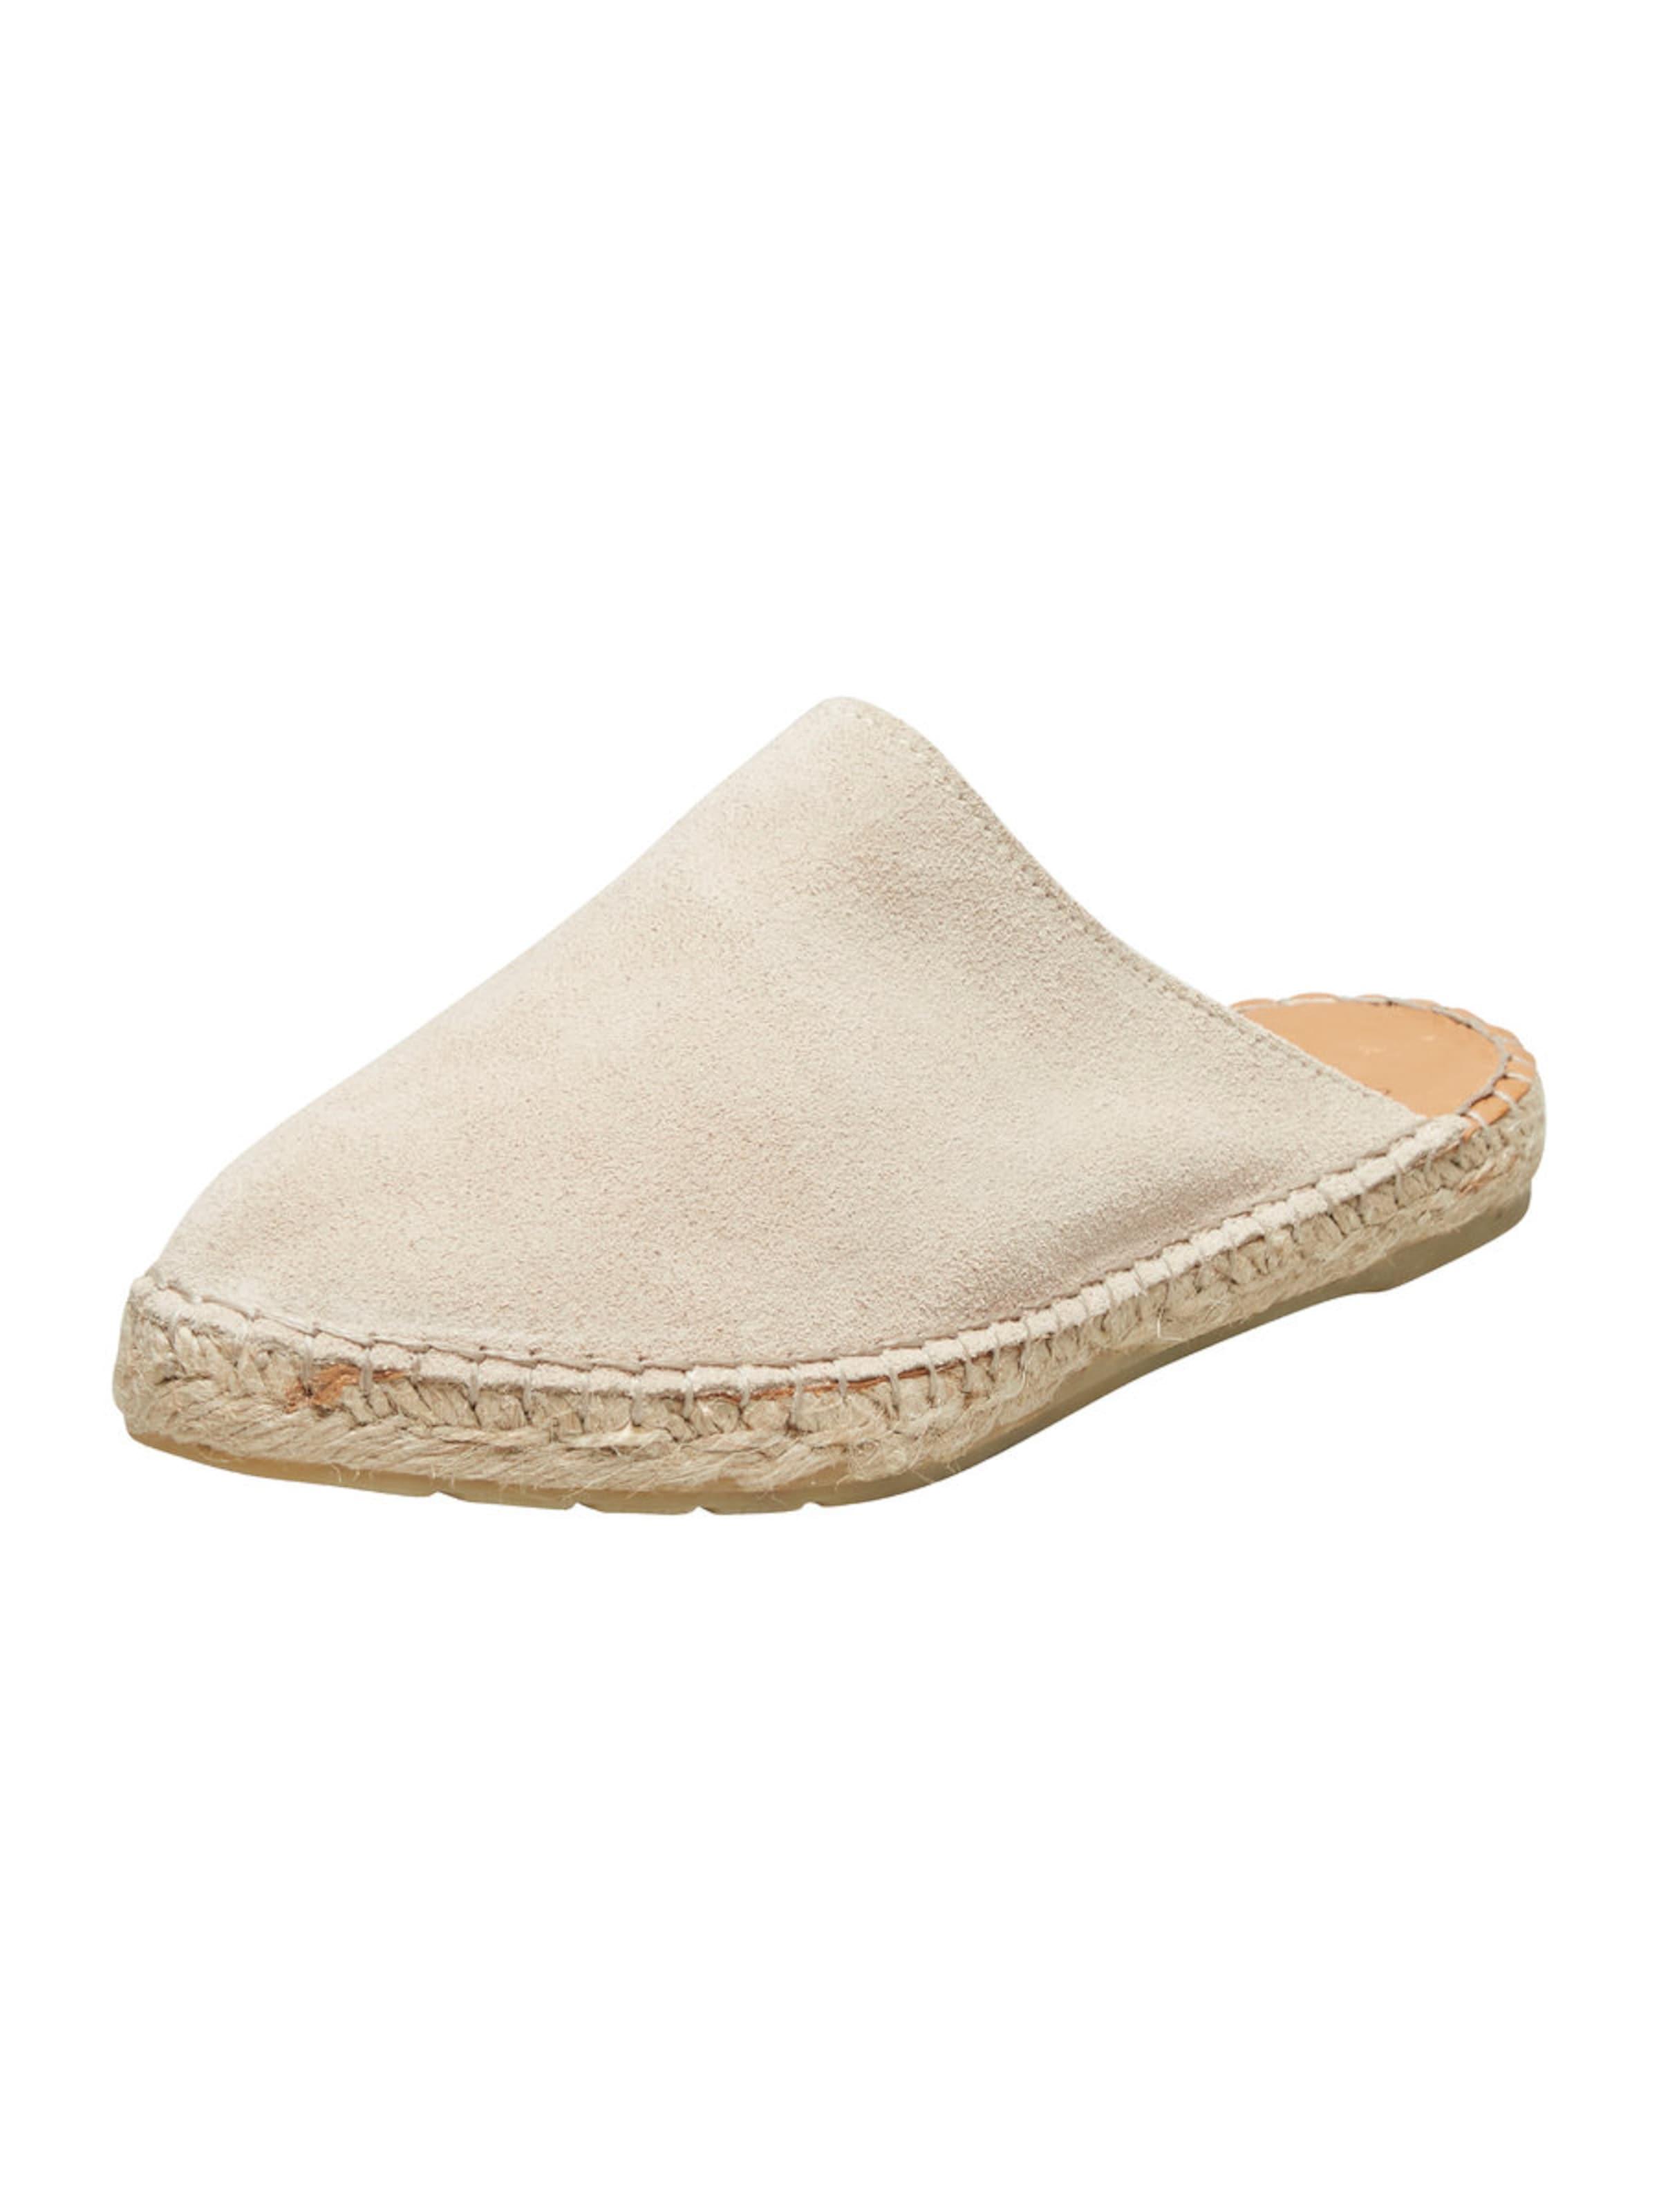 SELECTED FEMME Slider-Espadrilles Verschleißfeste billige Schuhe